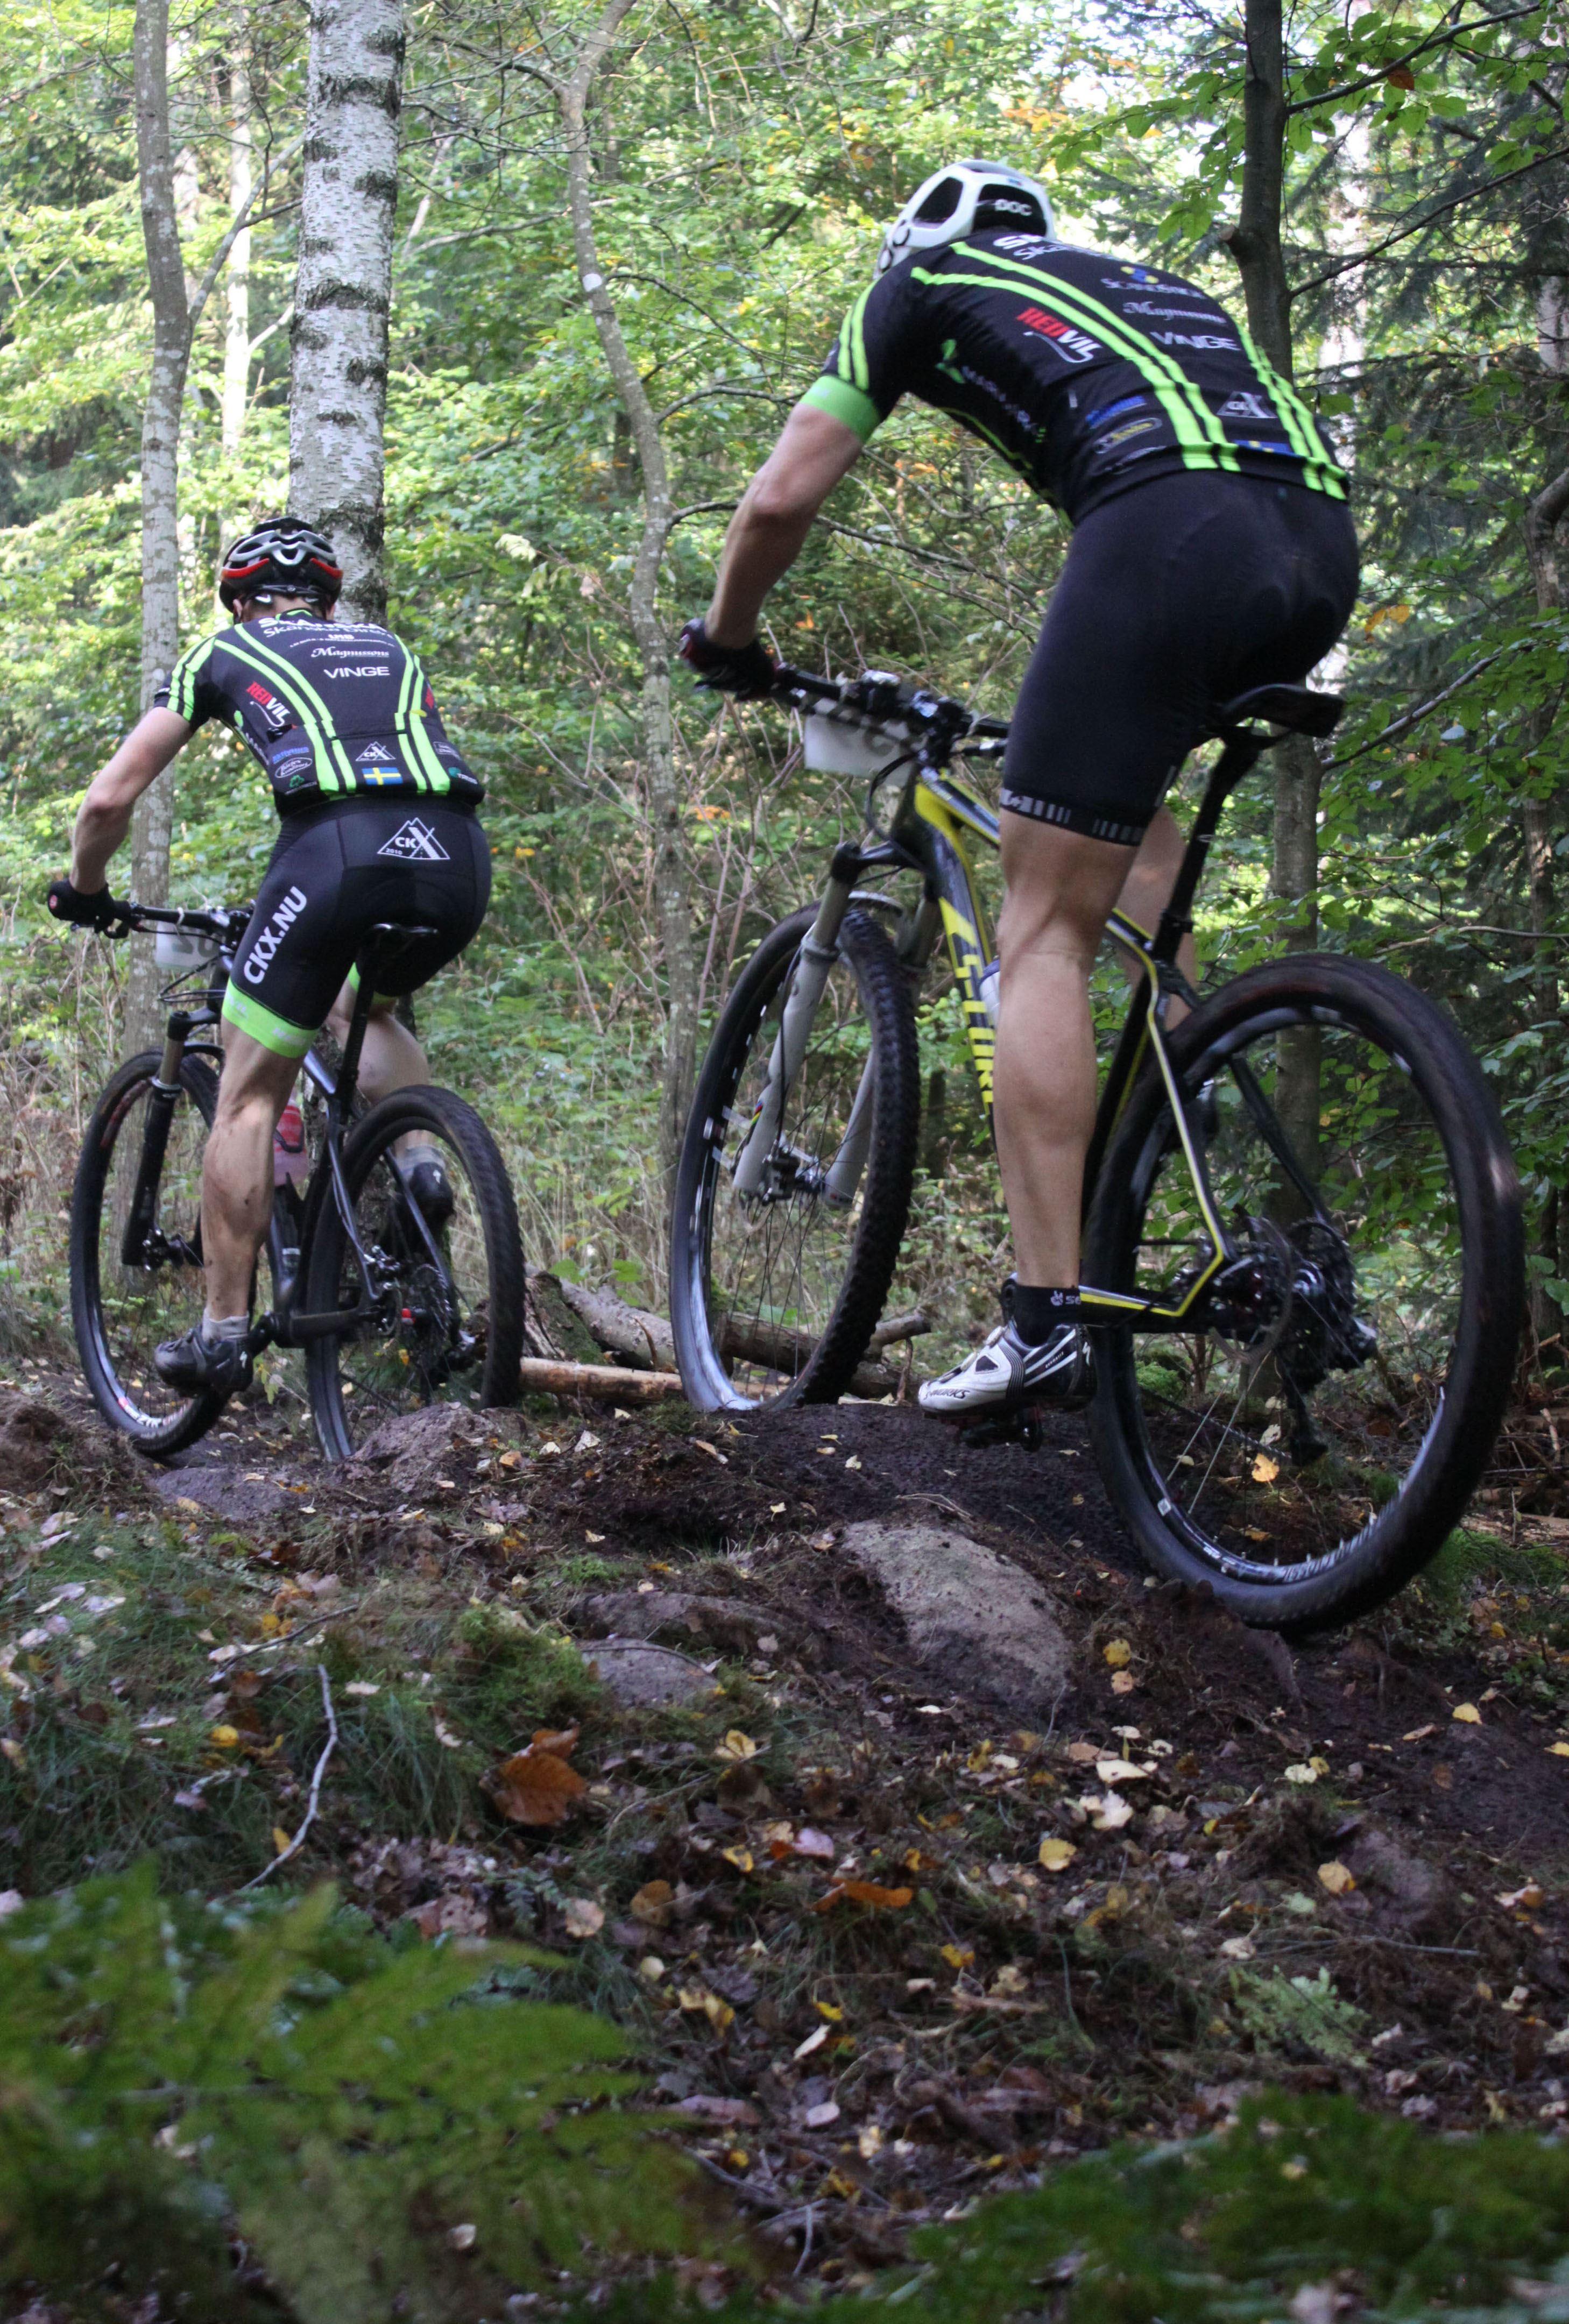 Foto: Anna Karlqvist, Mountainbike Orup - två cyklister